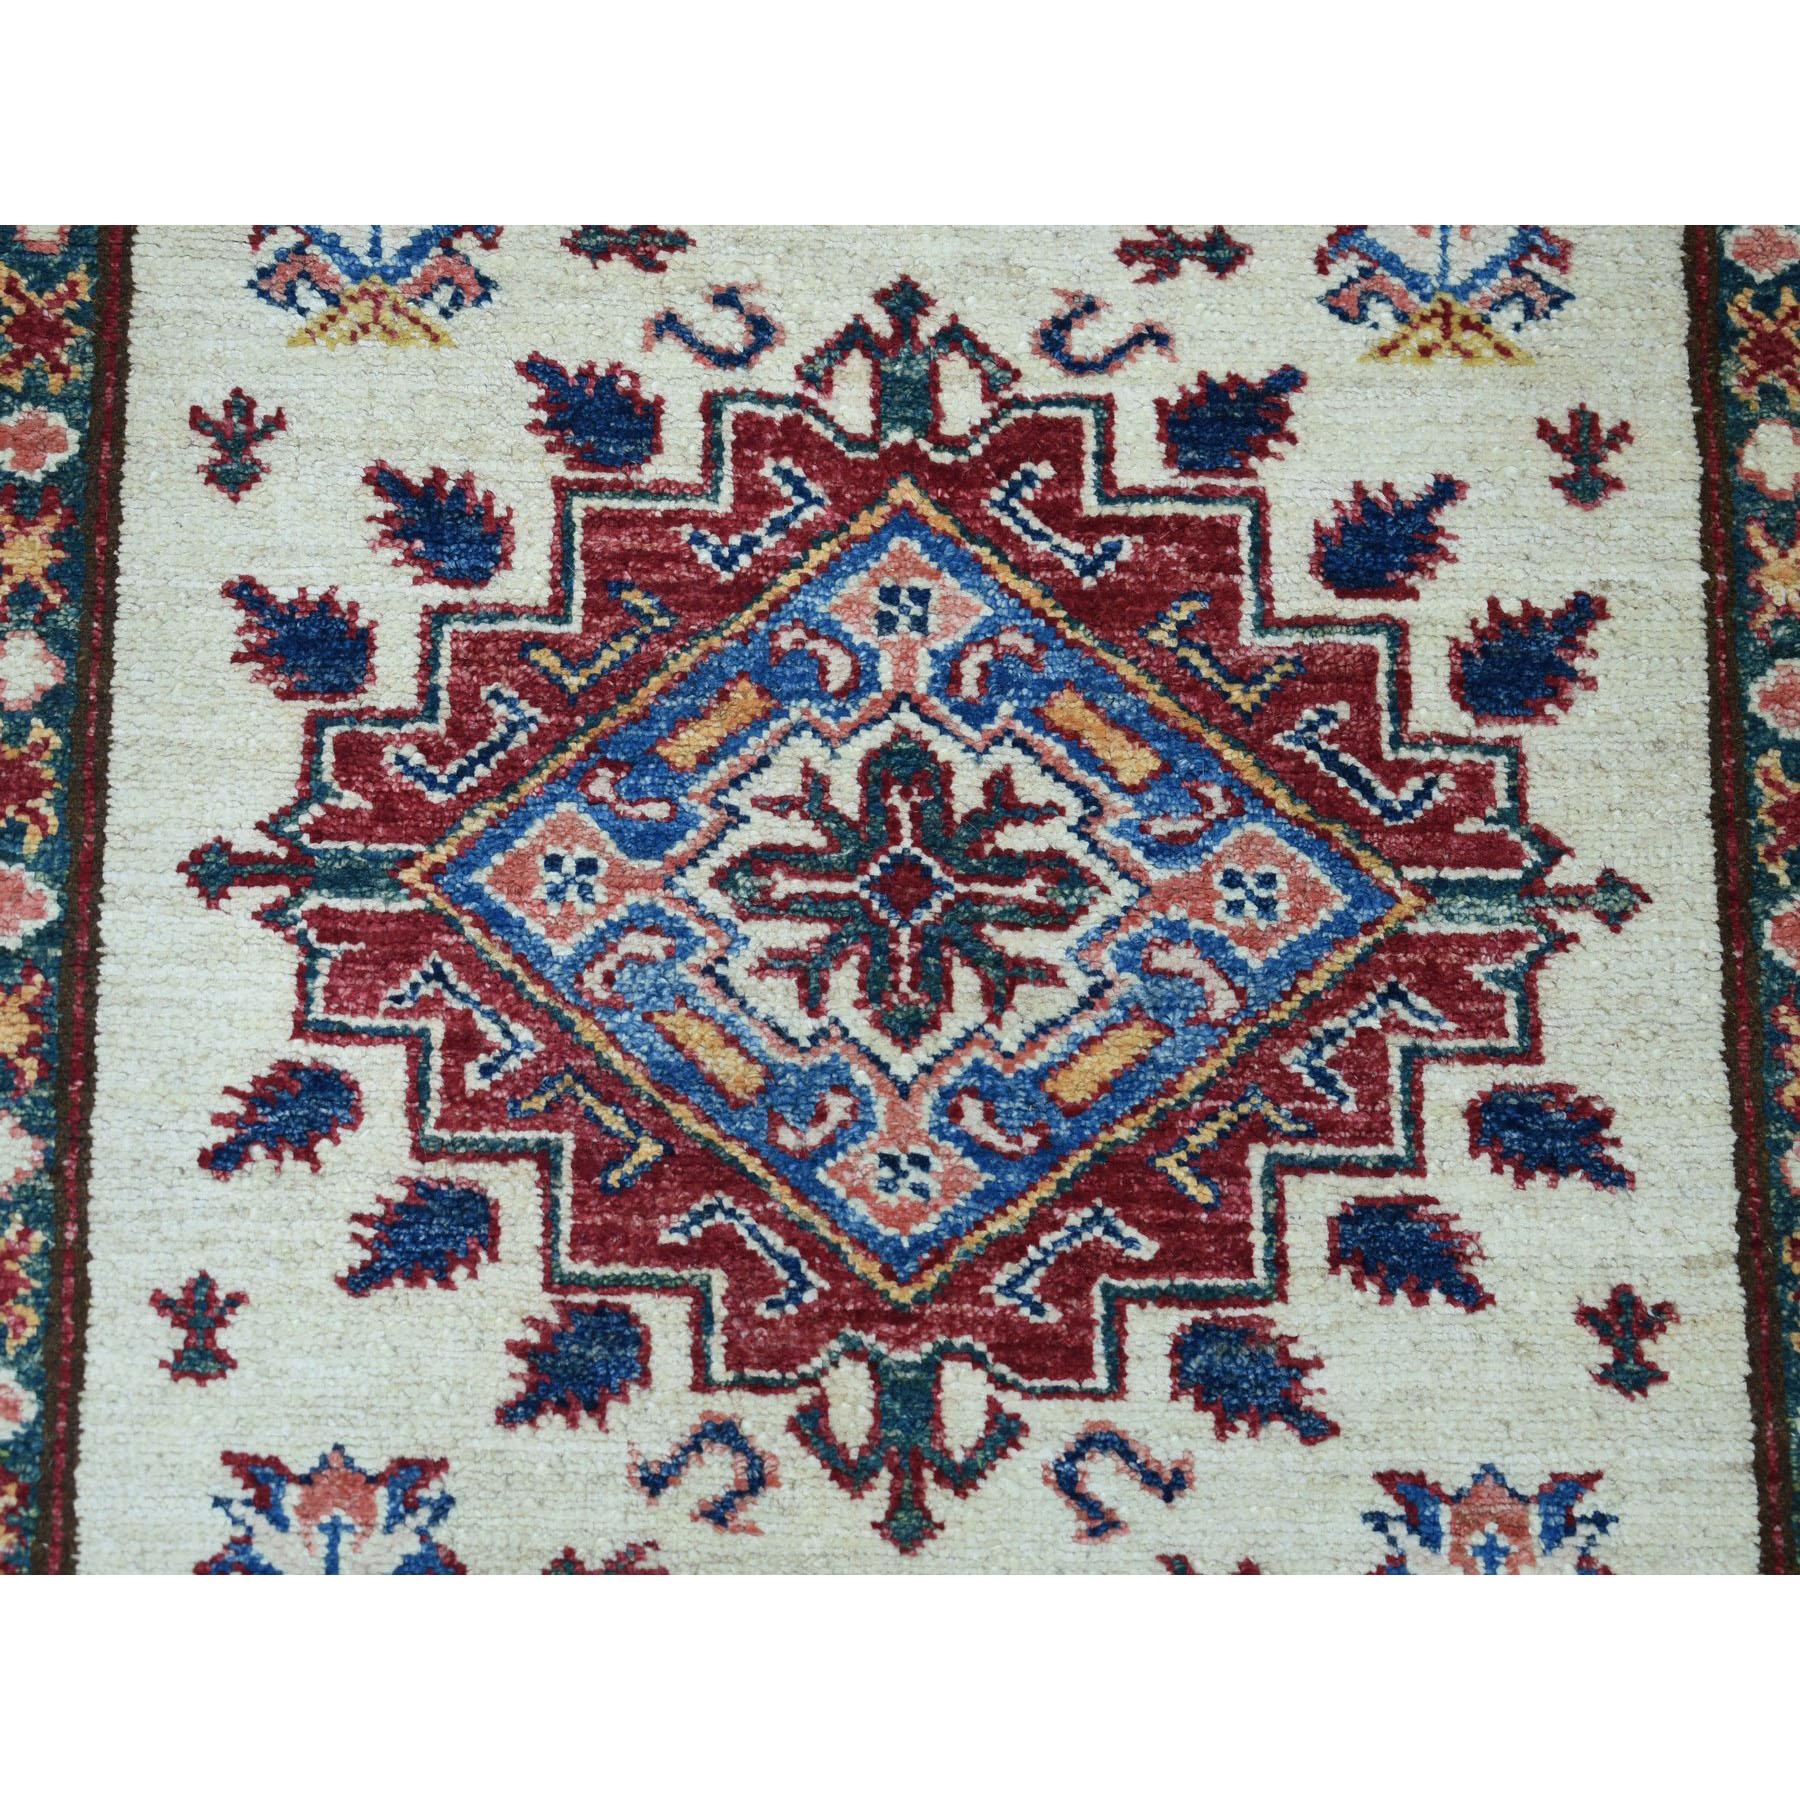 "2'10""x19'1"" Ivory Super Kazak Geometric Design XL Runner Pure Wool Hand-Knotted Oriental Rug"